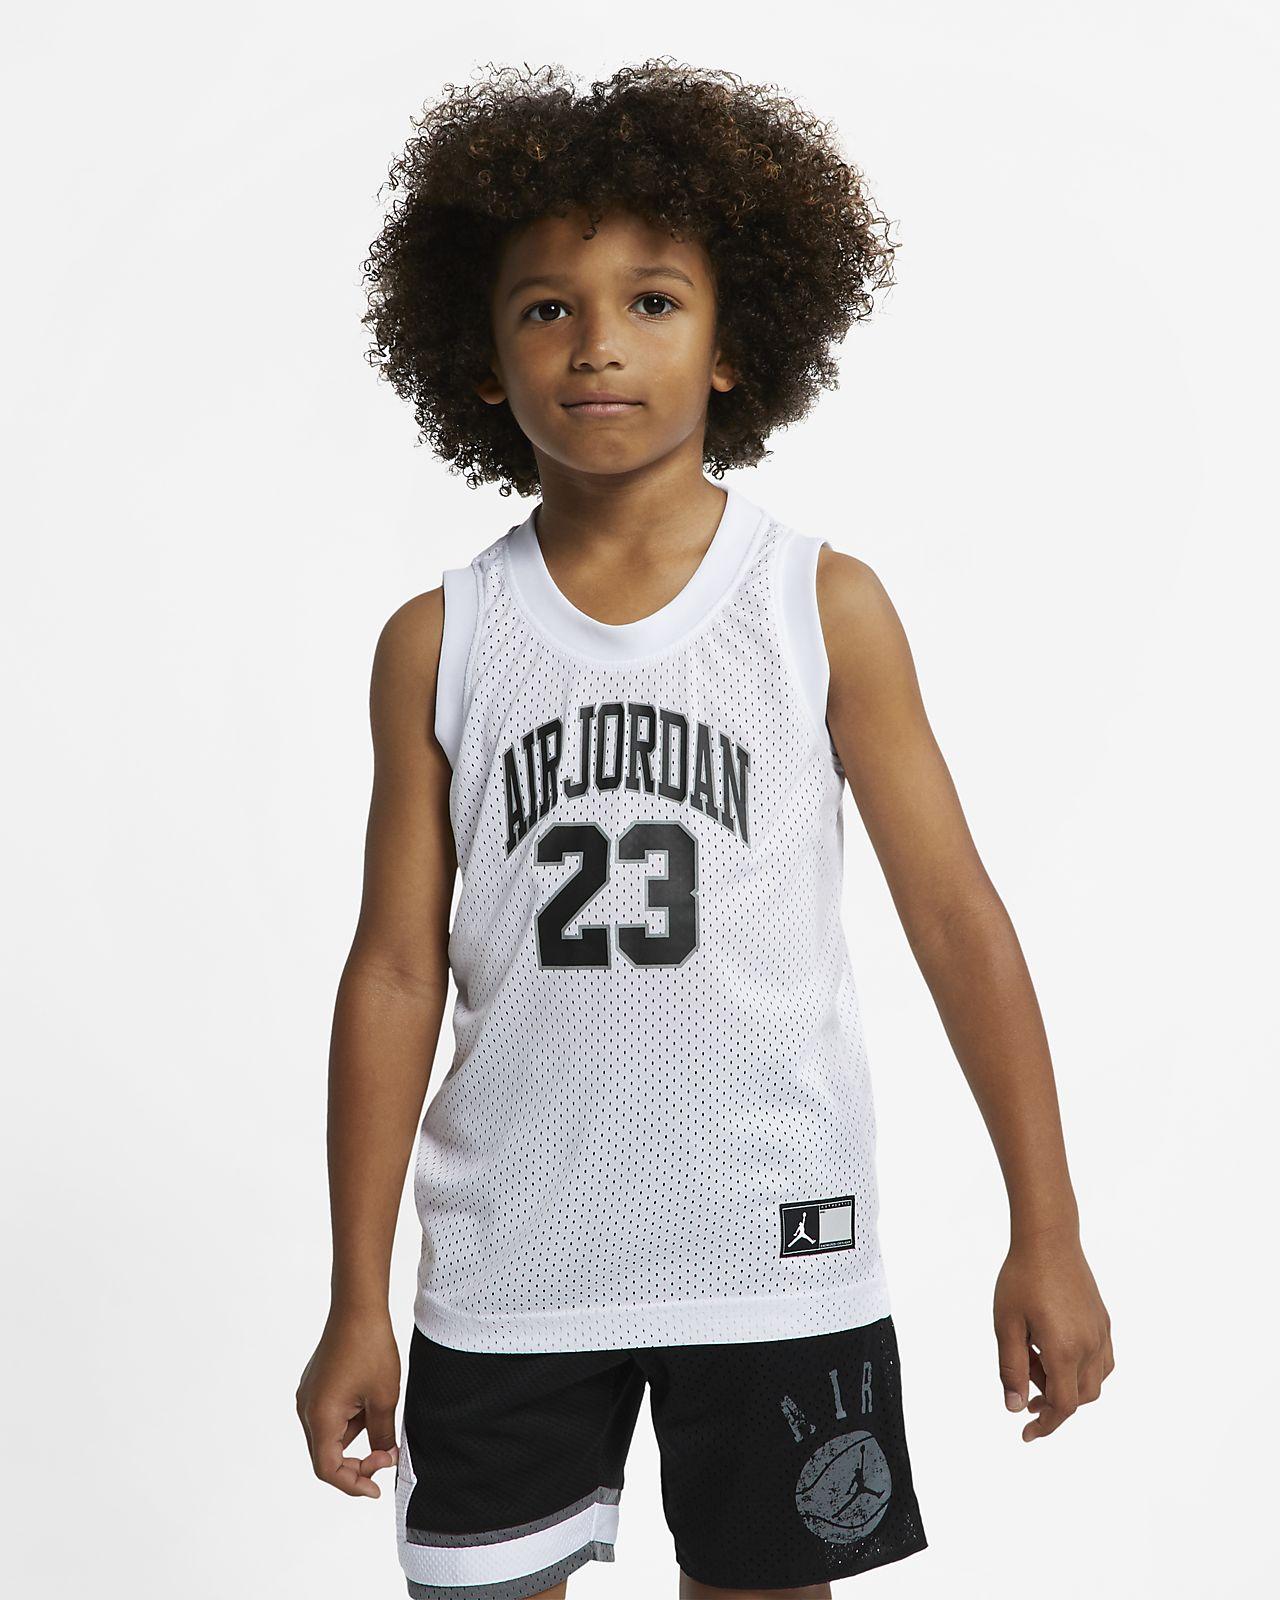 Jordan Dri-FIT DNA Camiseta - Niño/a pequeño/a